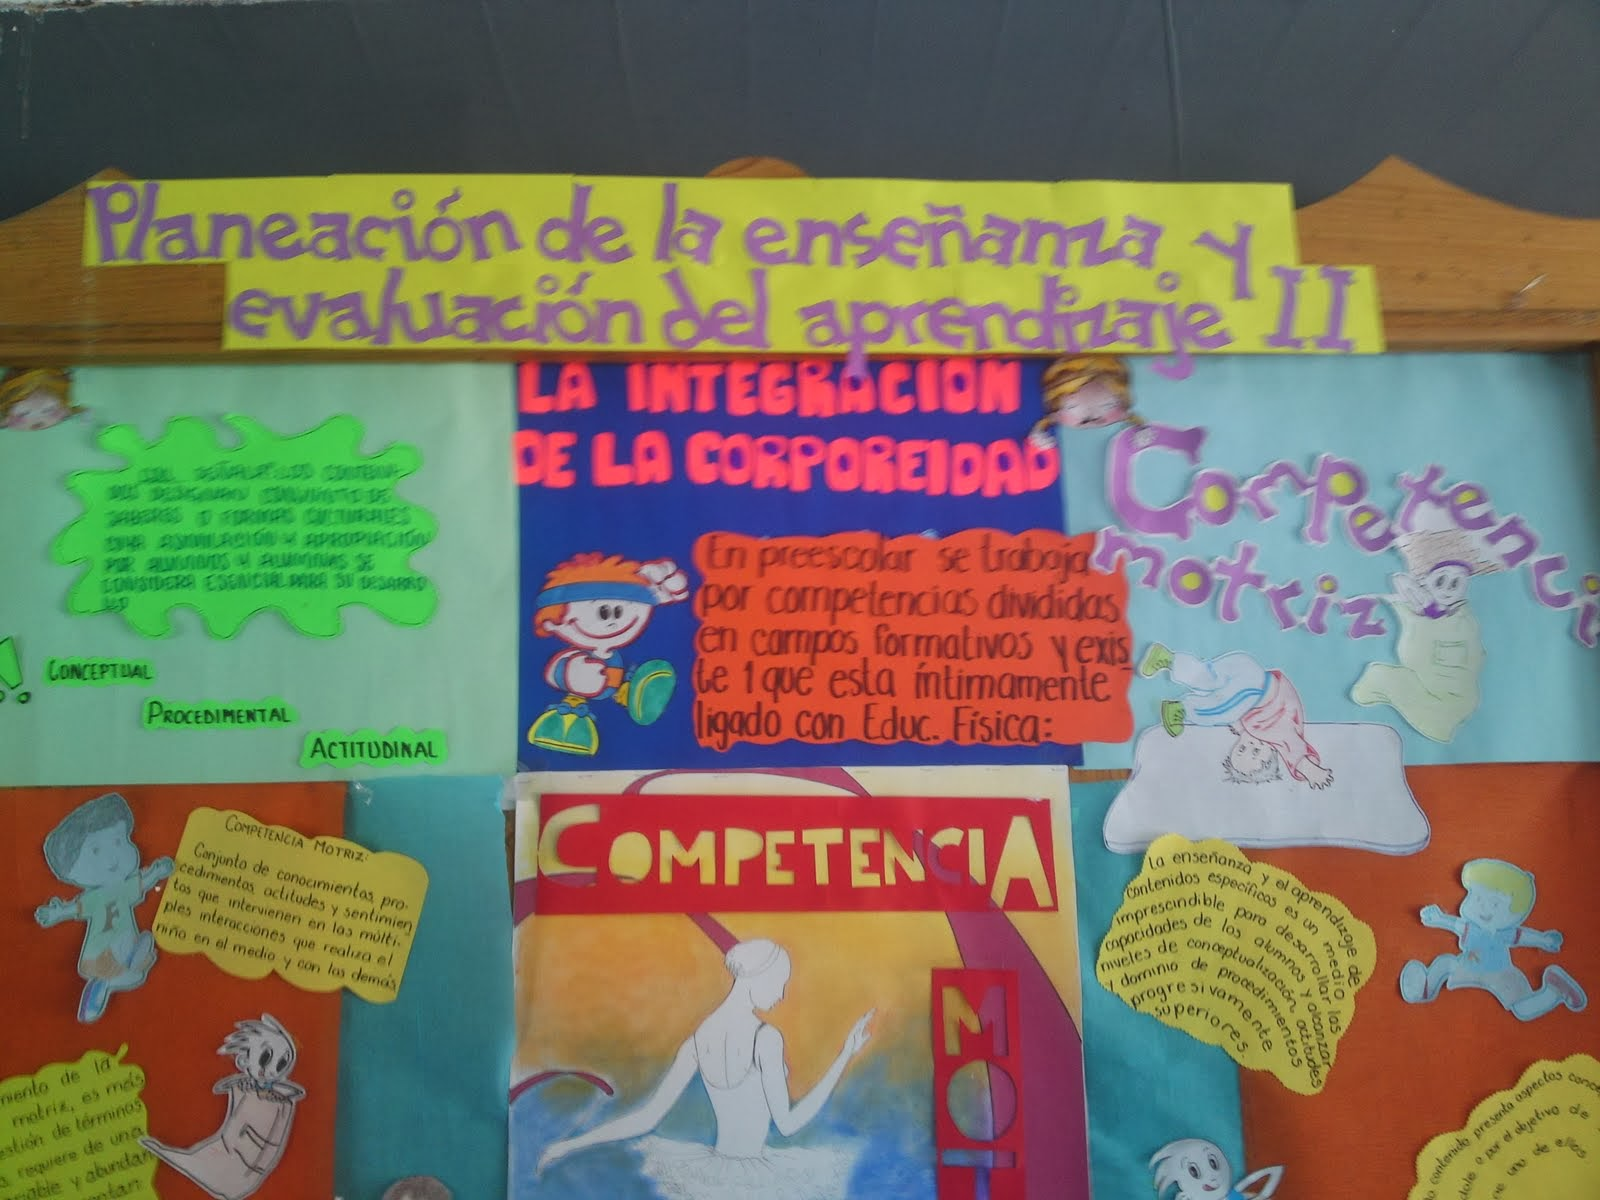 Blog de yuliana b ez p rez periodico mural de psicolog a for Contenido del periodico mural